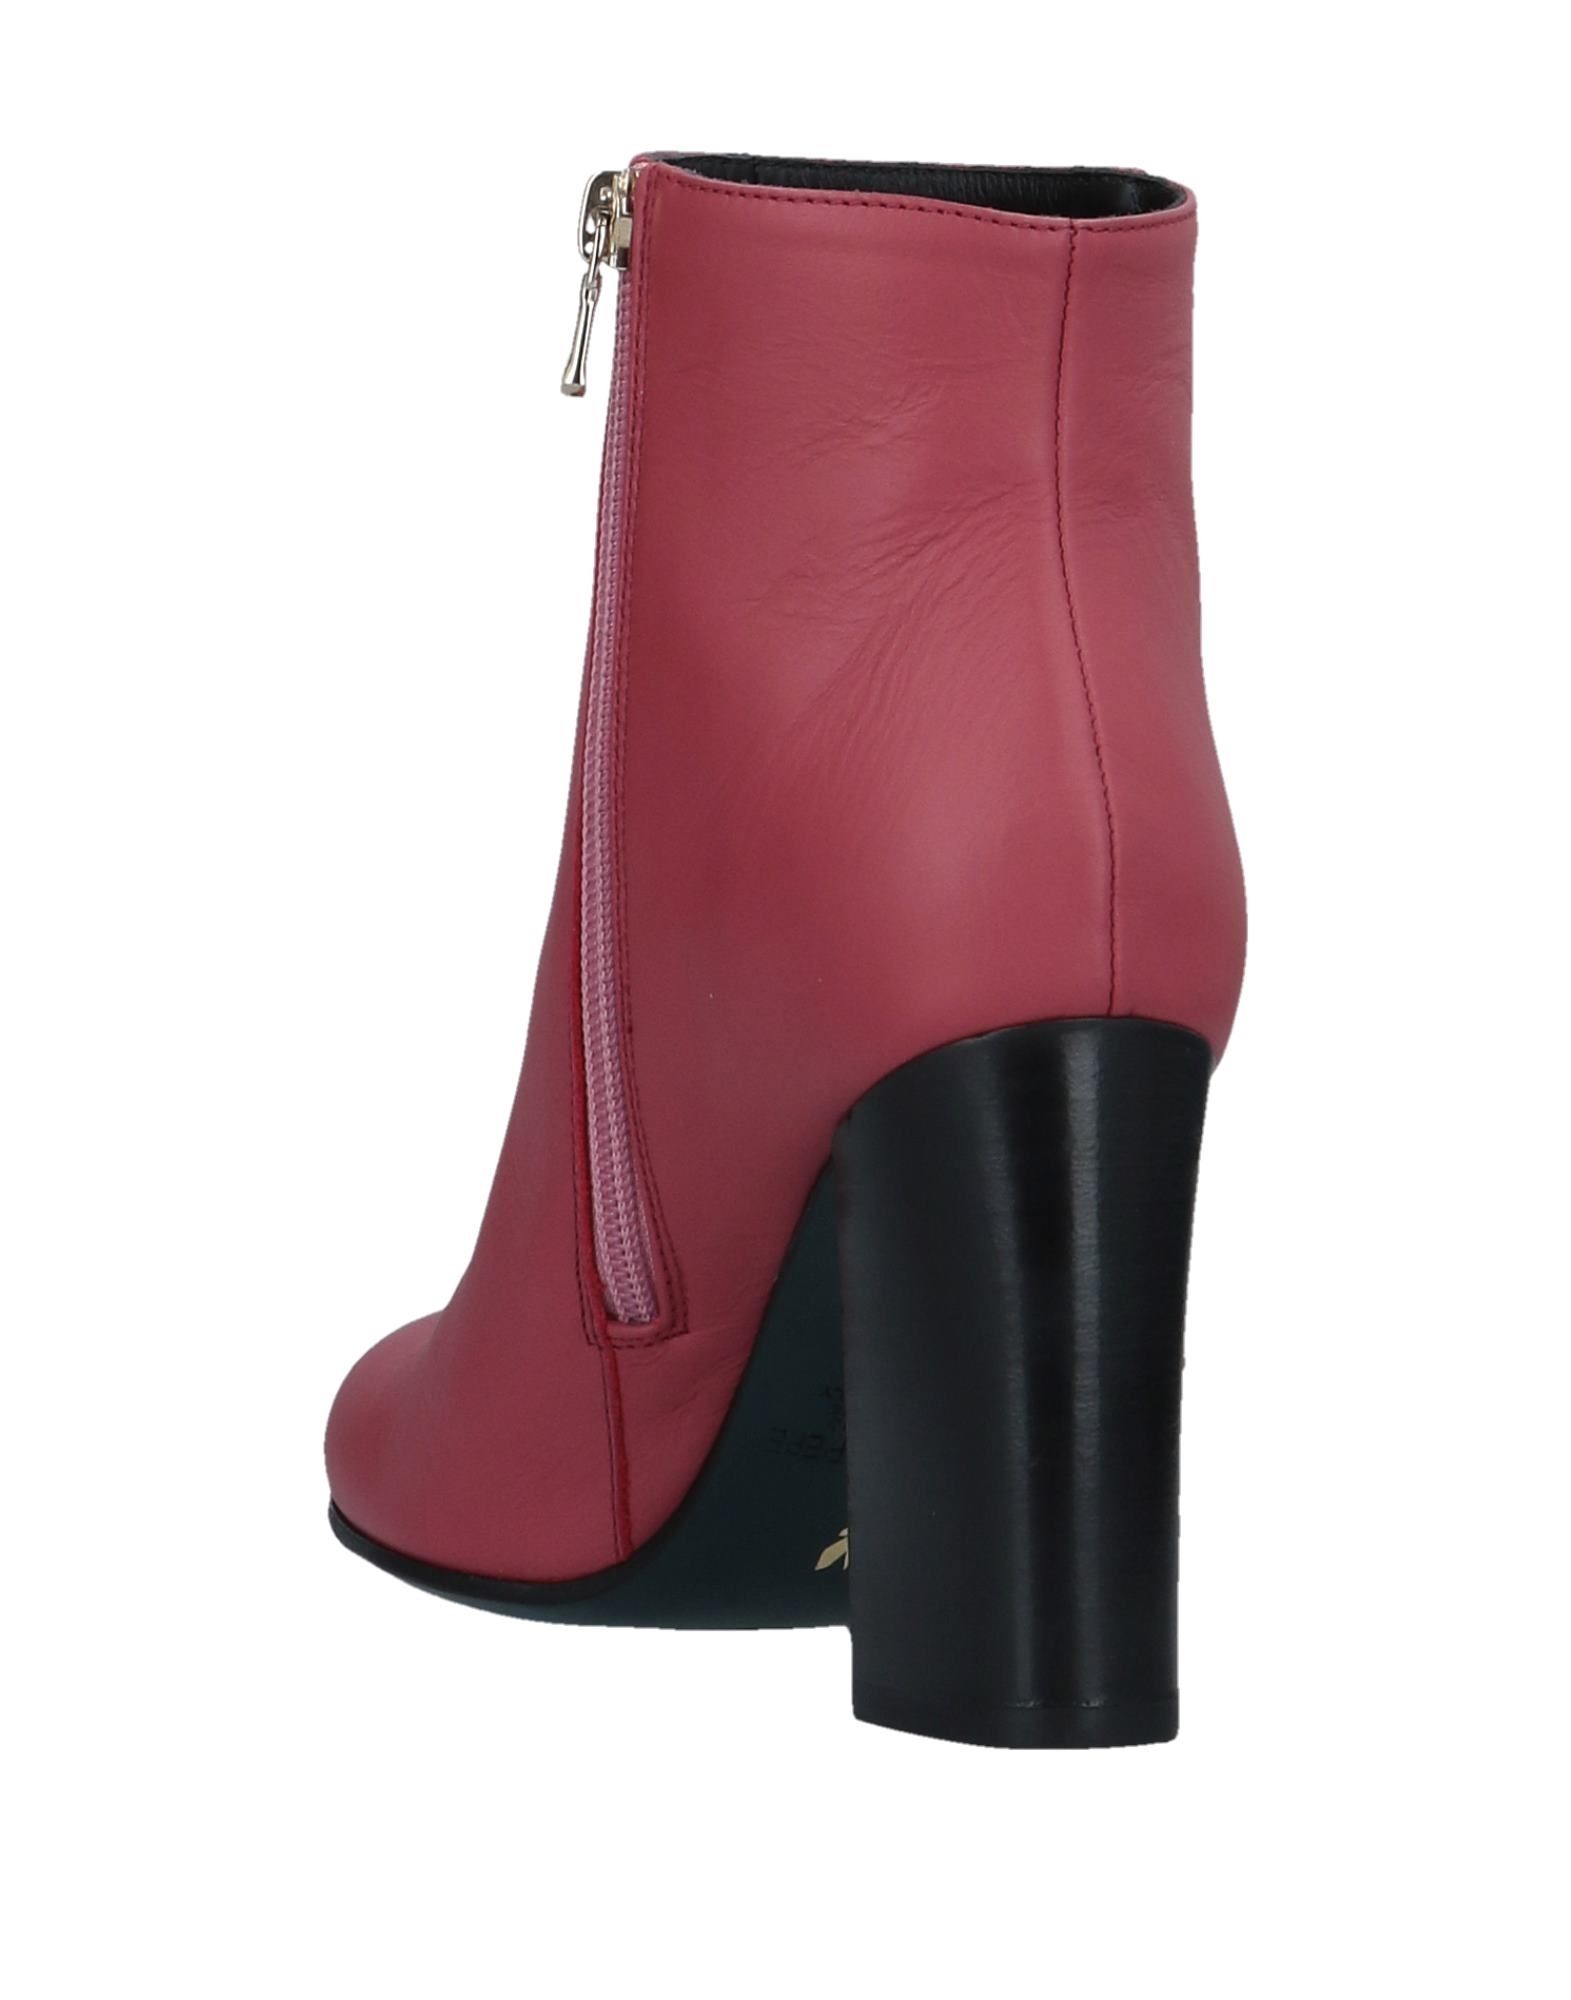 Stilvolle Pepe billige Schuhe Patrizia Pepe Stilvolle Stiefelette Damen  11527545FB 411d59